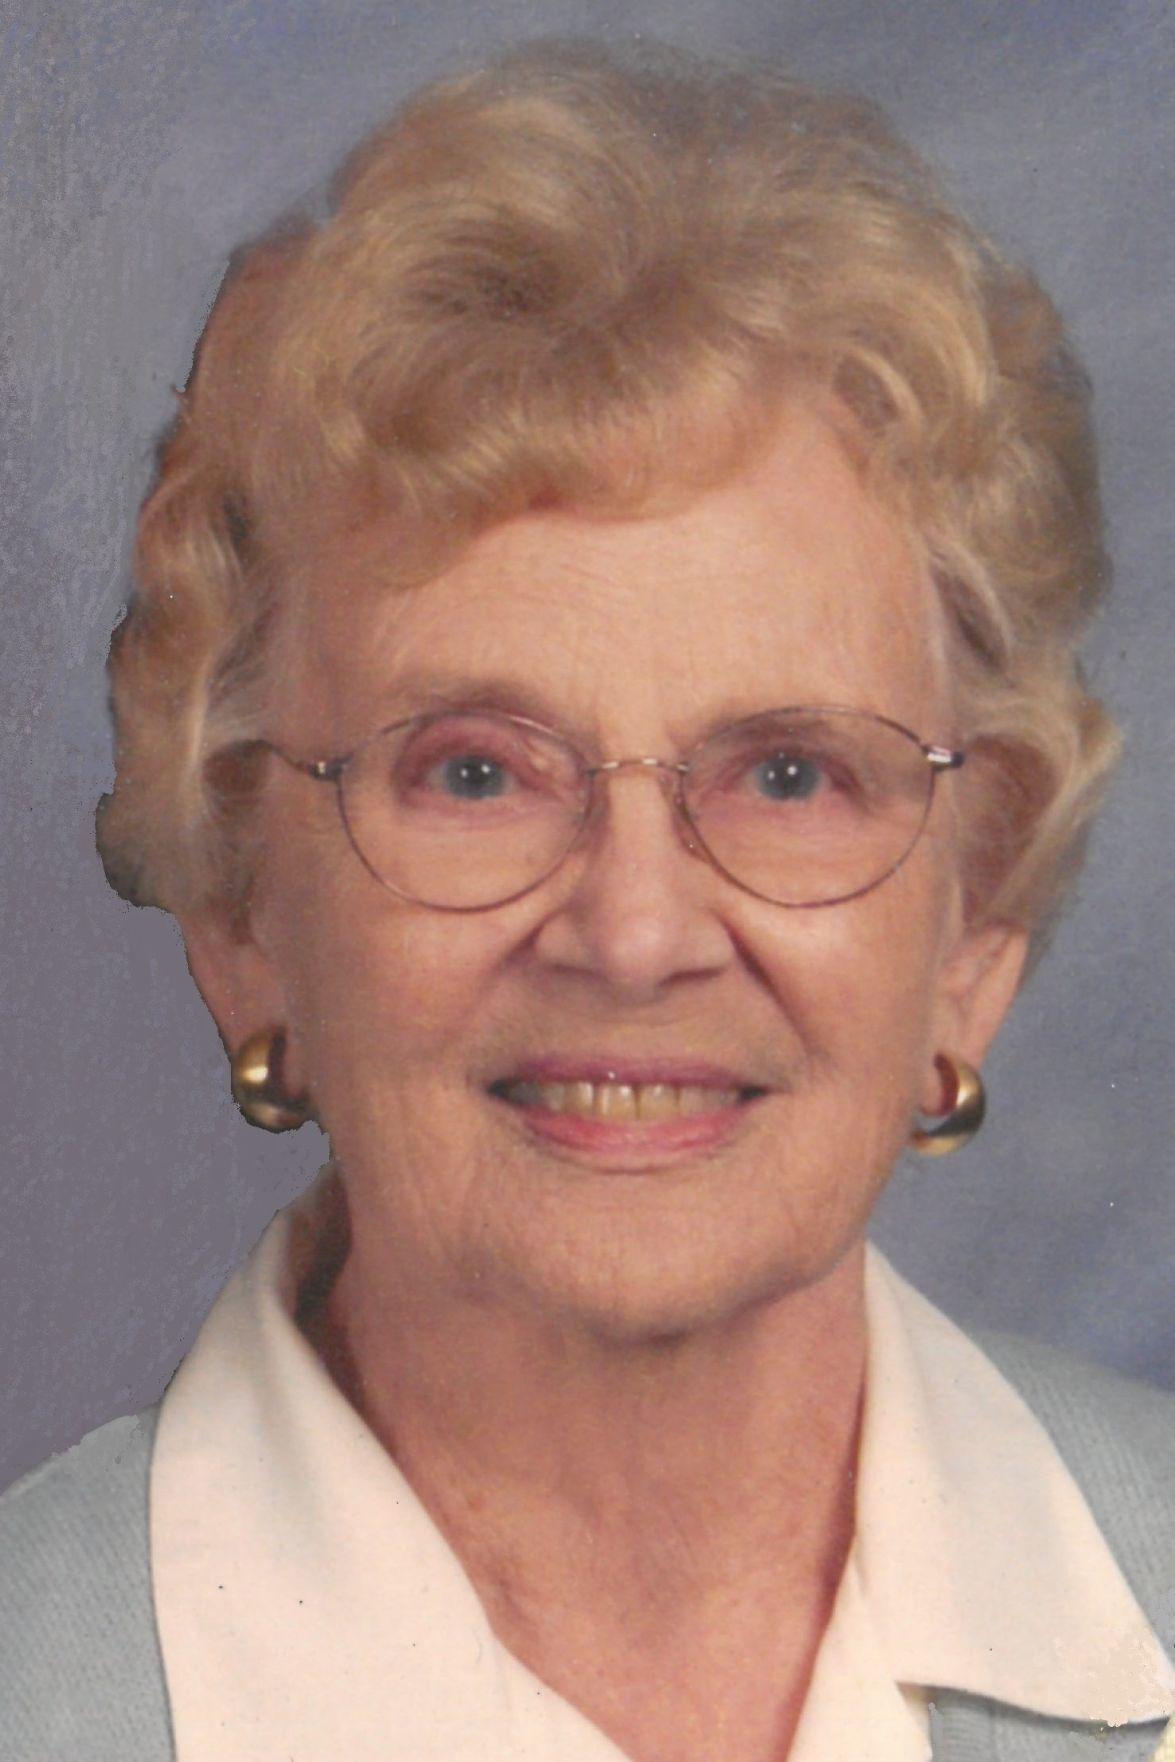 Jacqueline Bisset (born 1944)